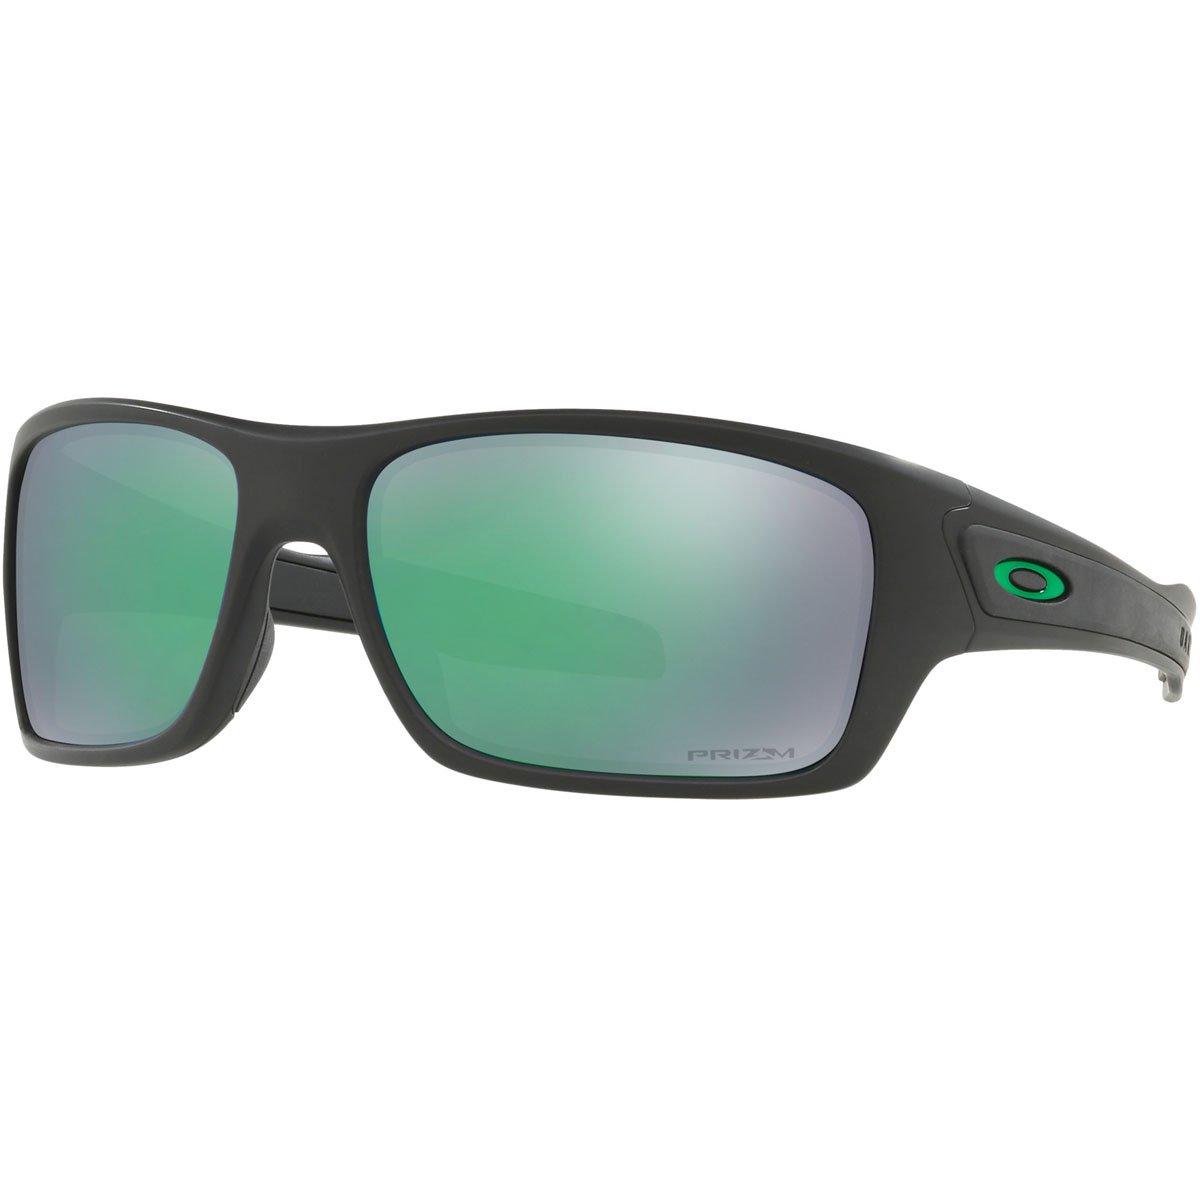 Oakley Mens Turbine Polarized Sunglasses, Matte Black/Prizm Jade Pol,OS